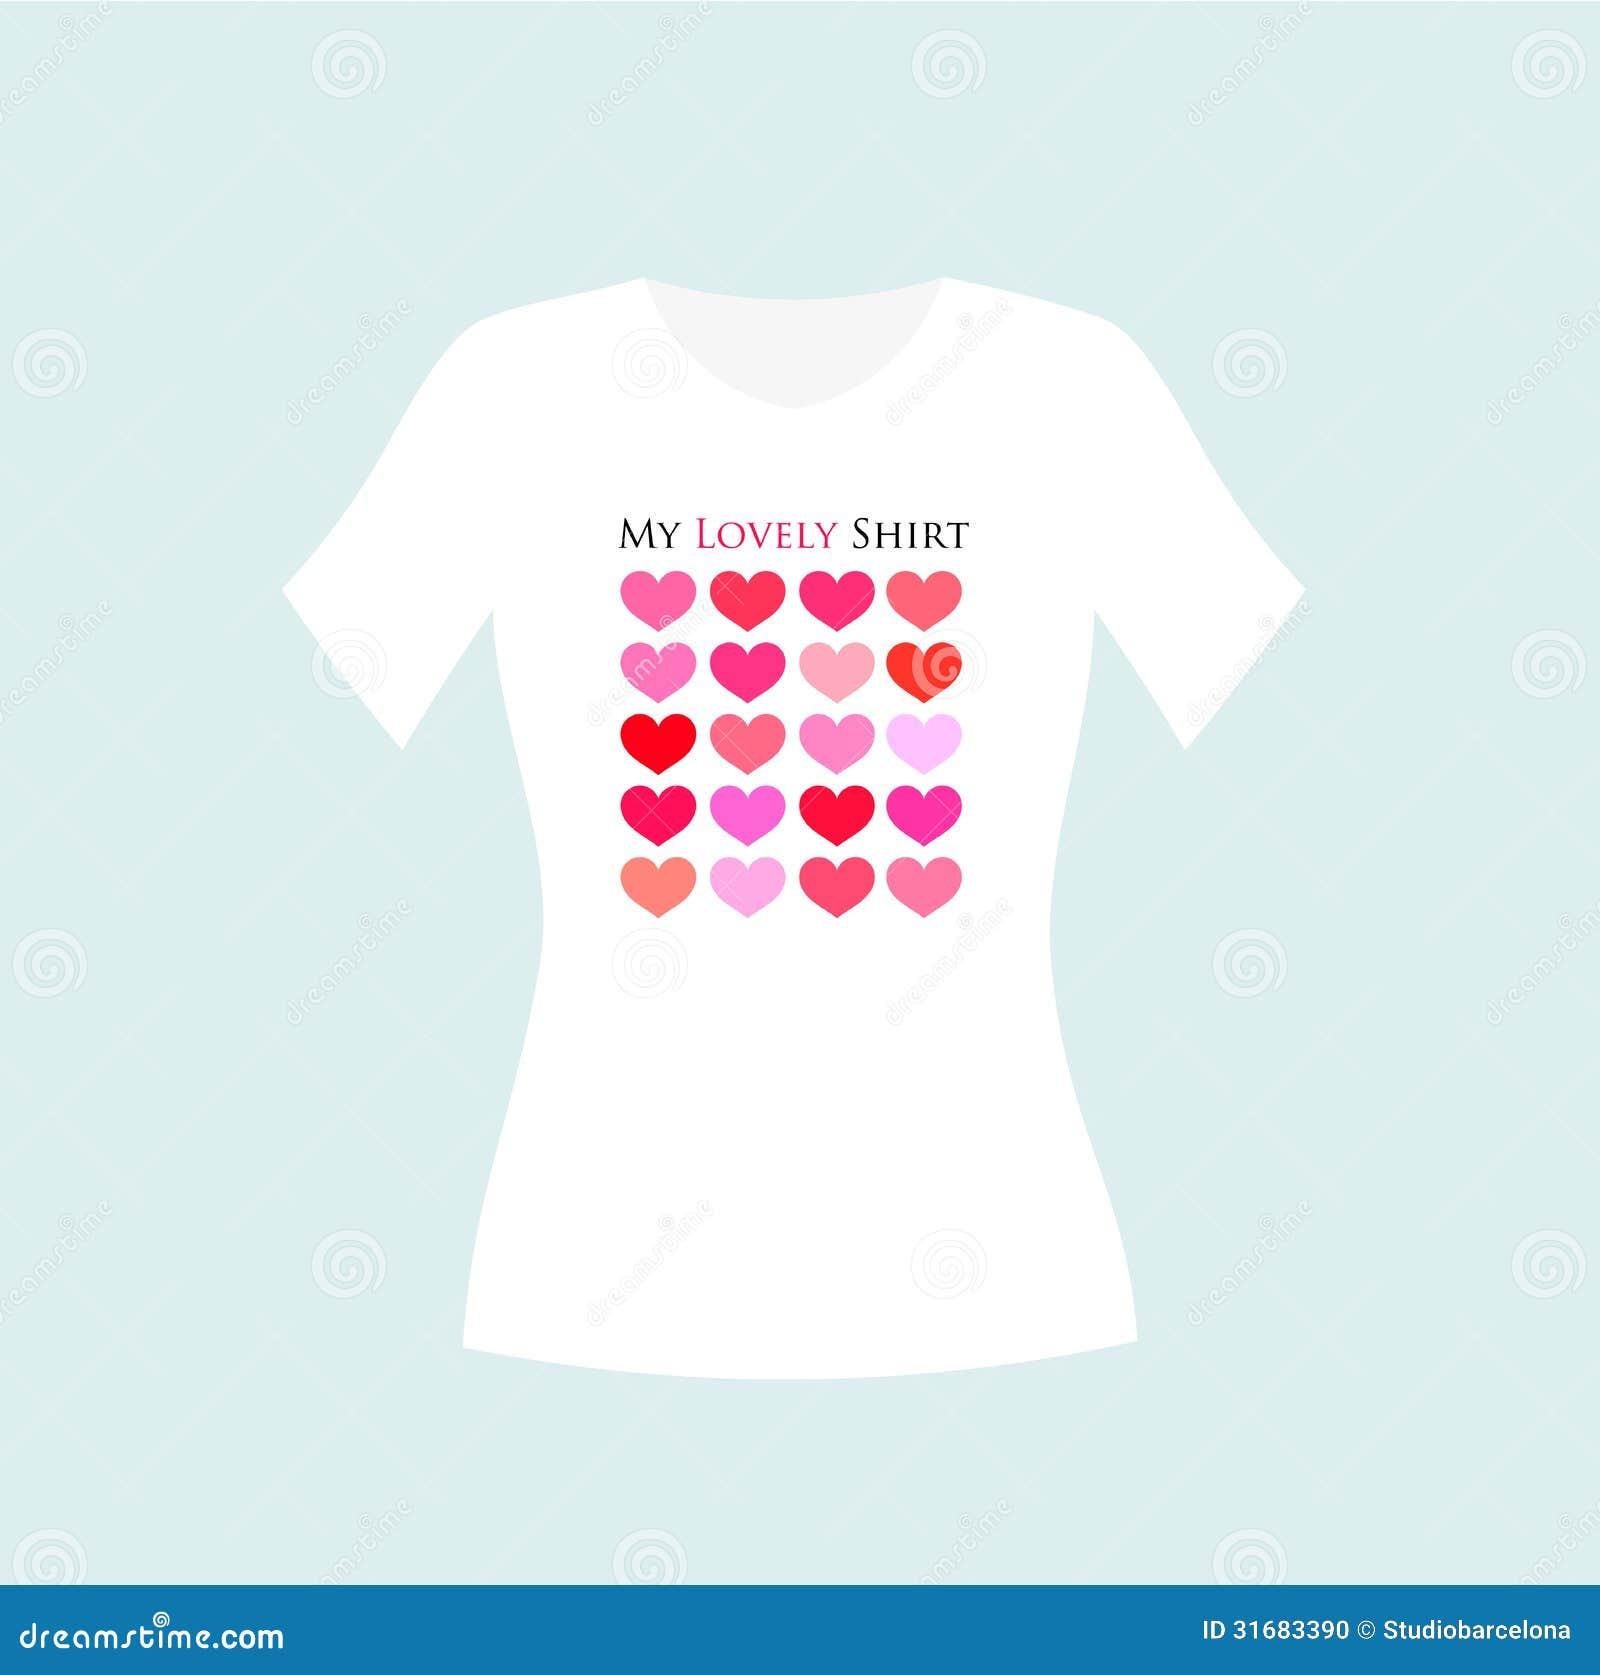 Cute T Shirt Designs For Girls Images Victoria School Craft Fair ...